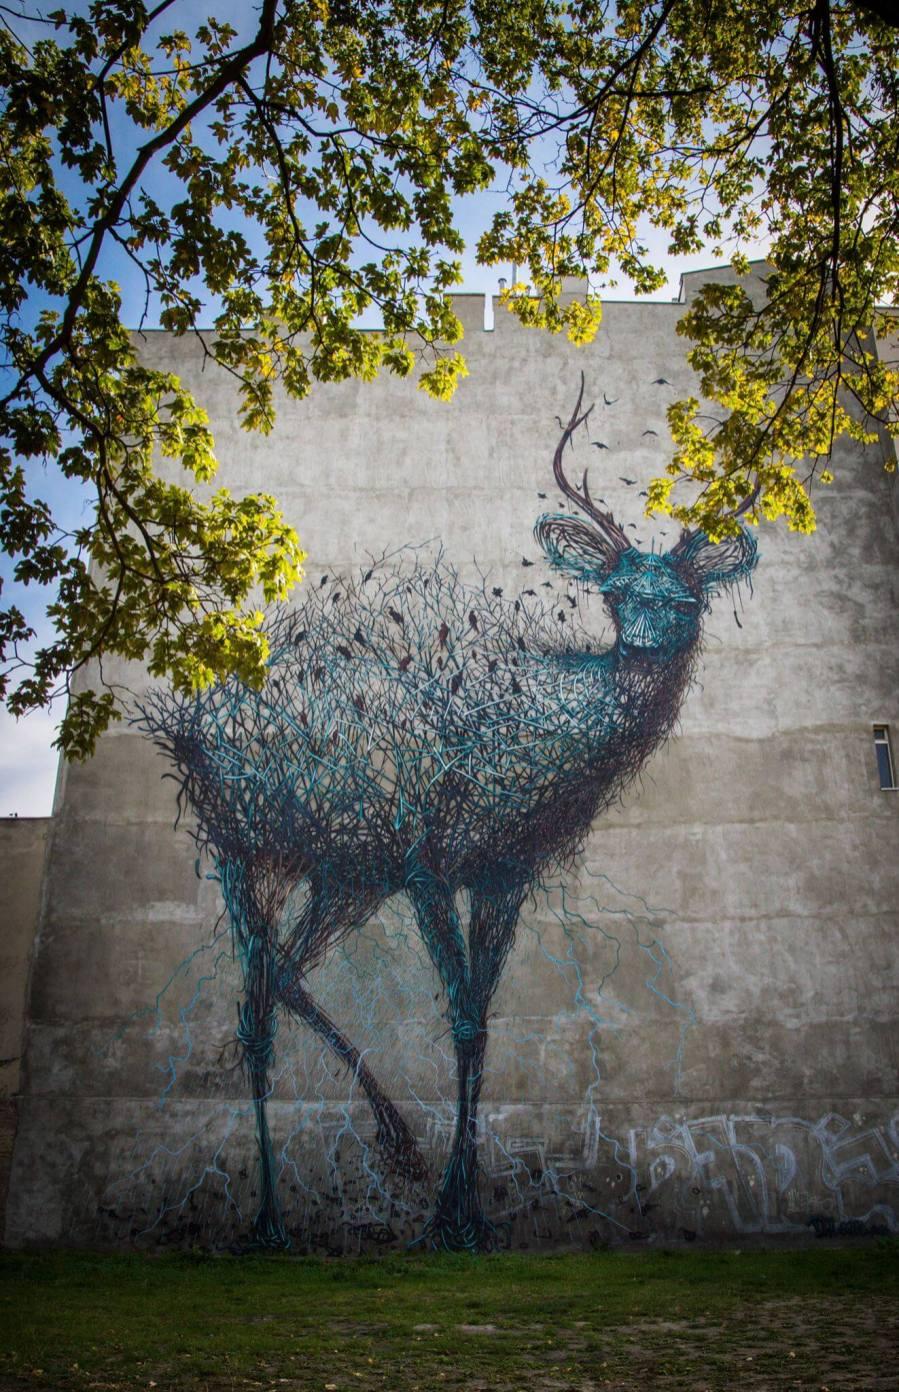 Daleast, Urban Forms street art gallery, Lodz, Poland. Photo credit M. Sikora